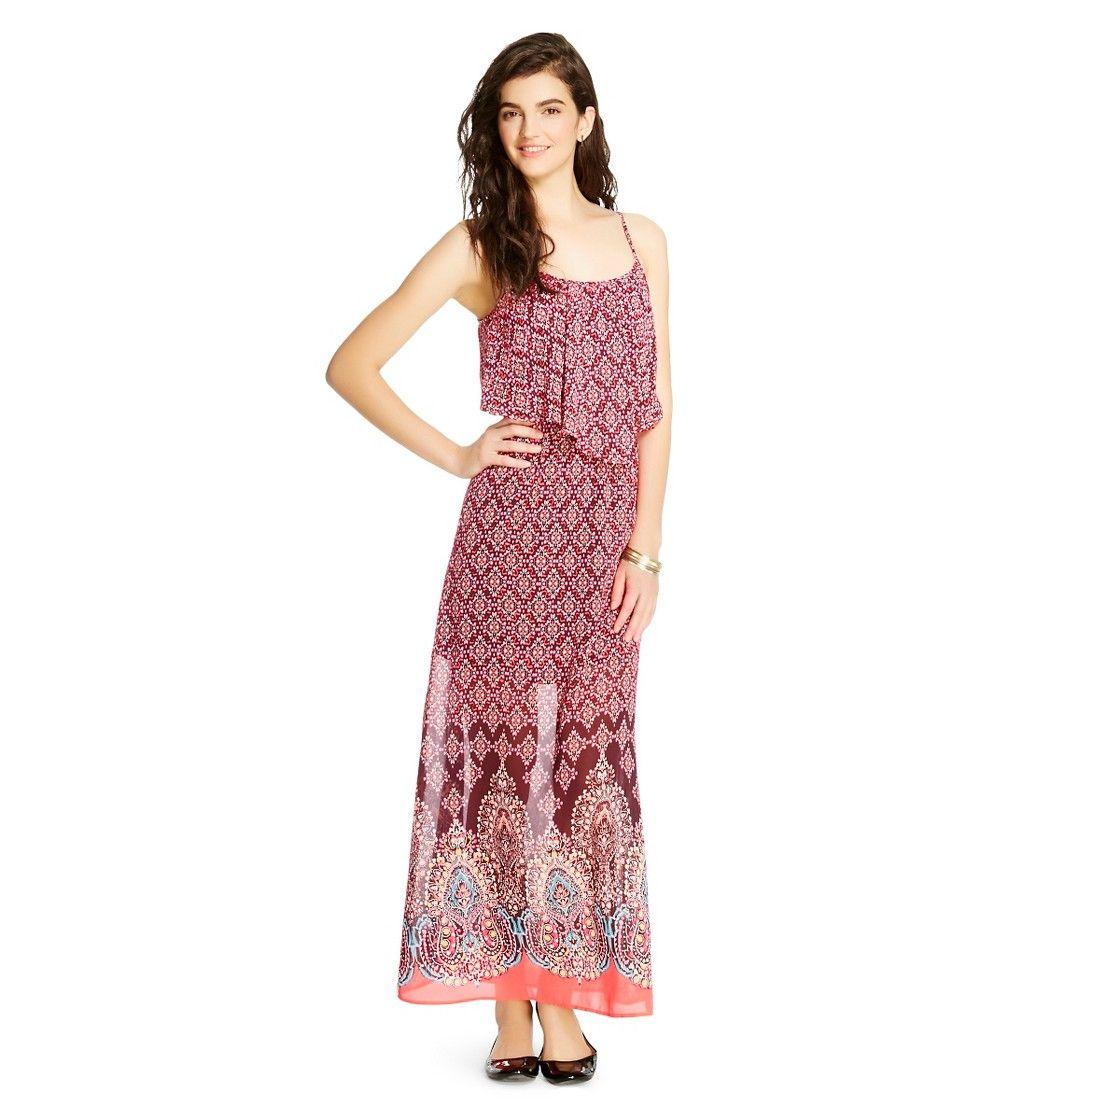 Handkerchief Popover Maxi Dress Xhilaration Maxi Dress Fashion Outfits Dresses [ 1120 x 1120 Pixel ]